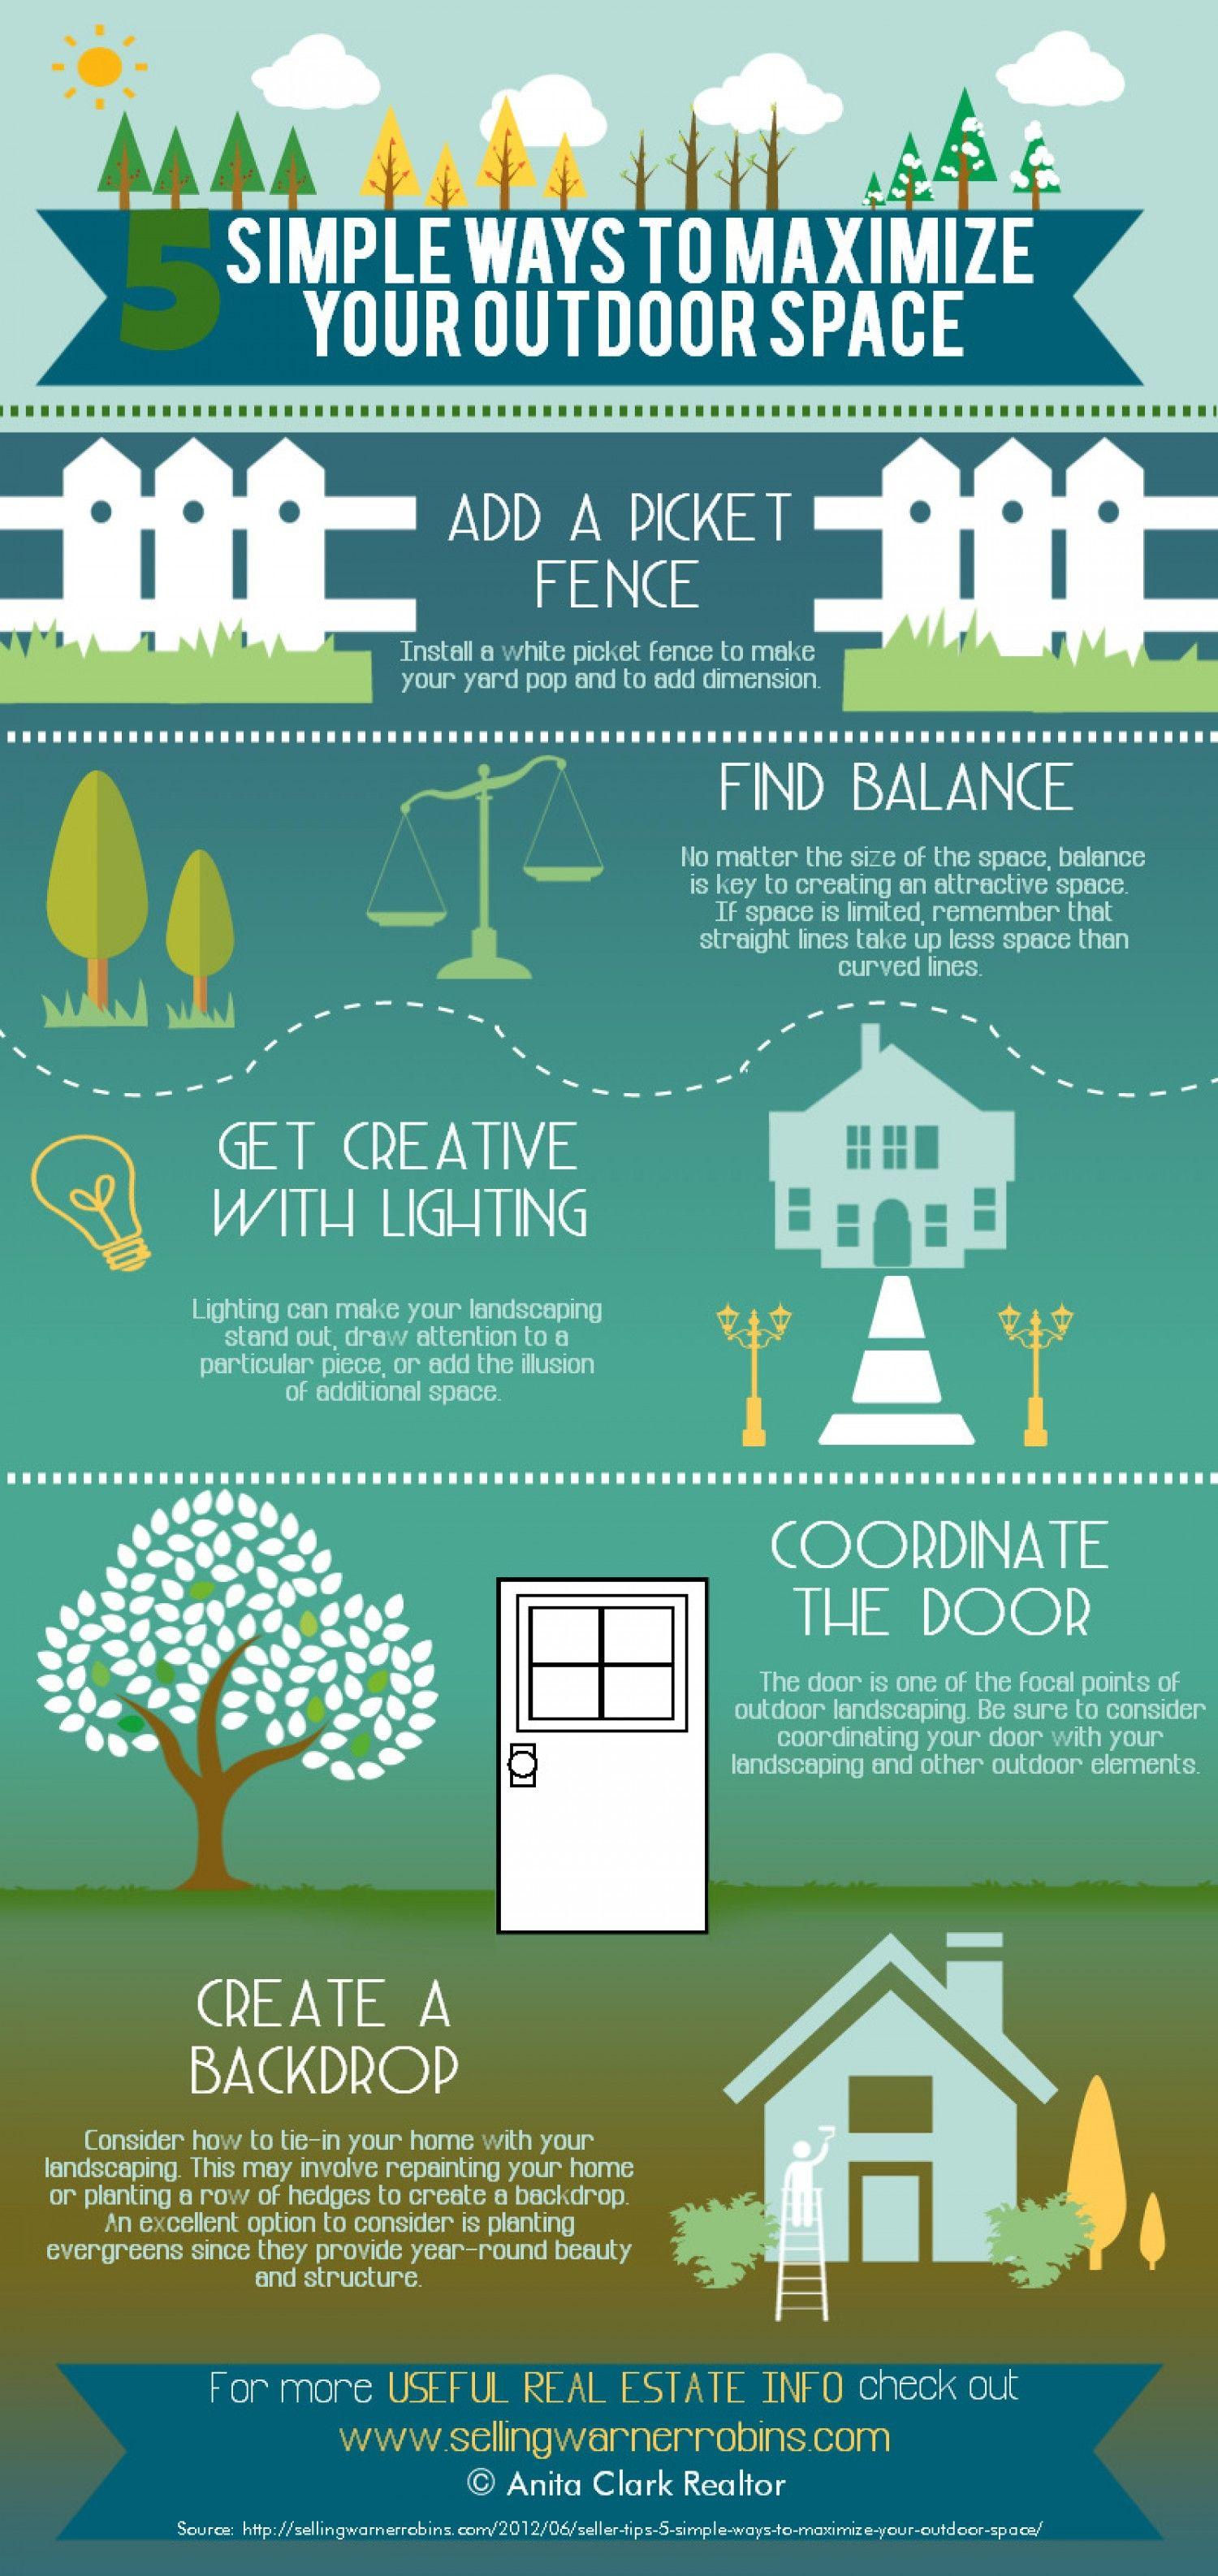 seller tips 5 simple ways maximize